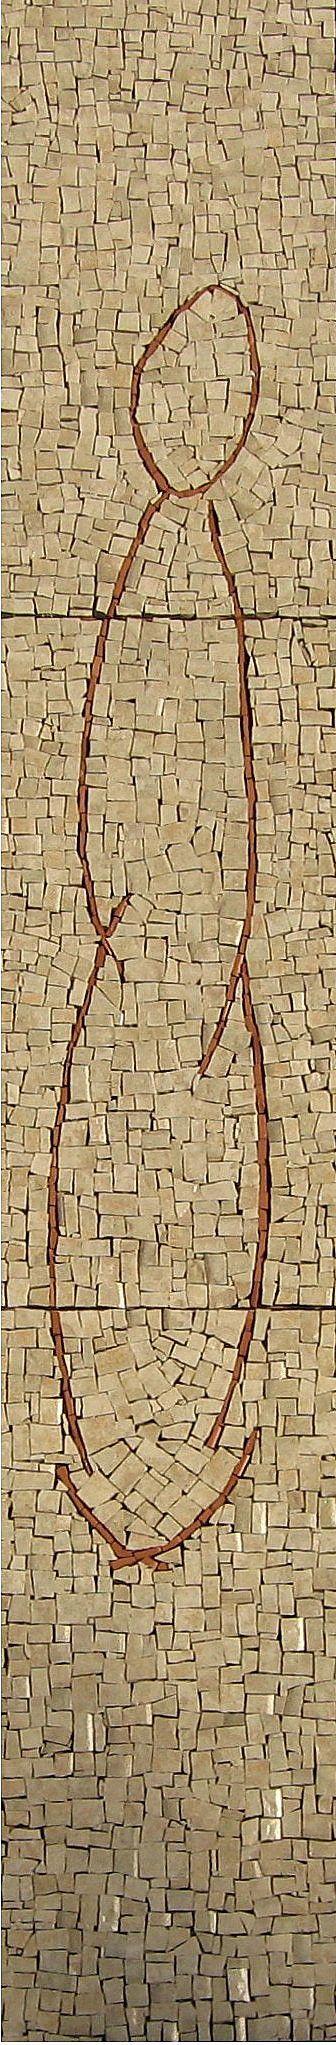 figure - mosaico figure - mosaic